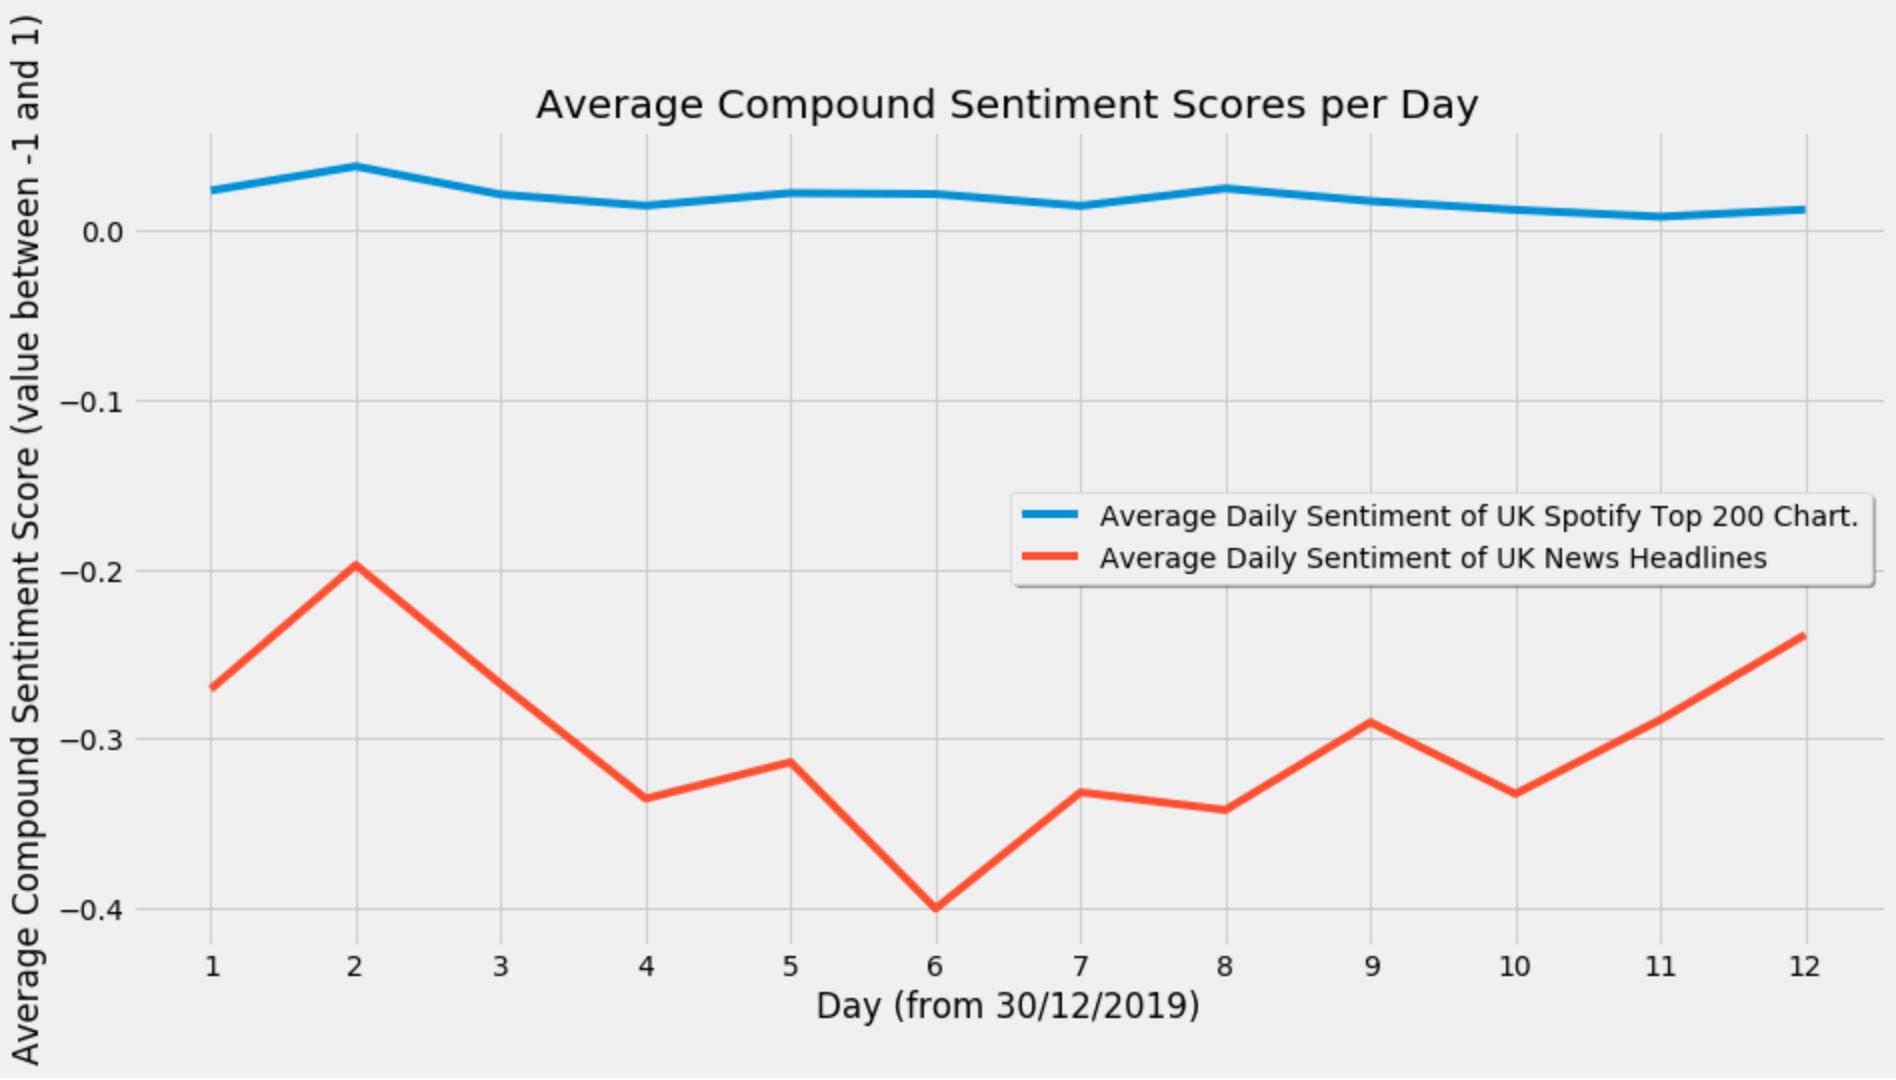 Av Compound Sentiment per Day.png